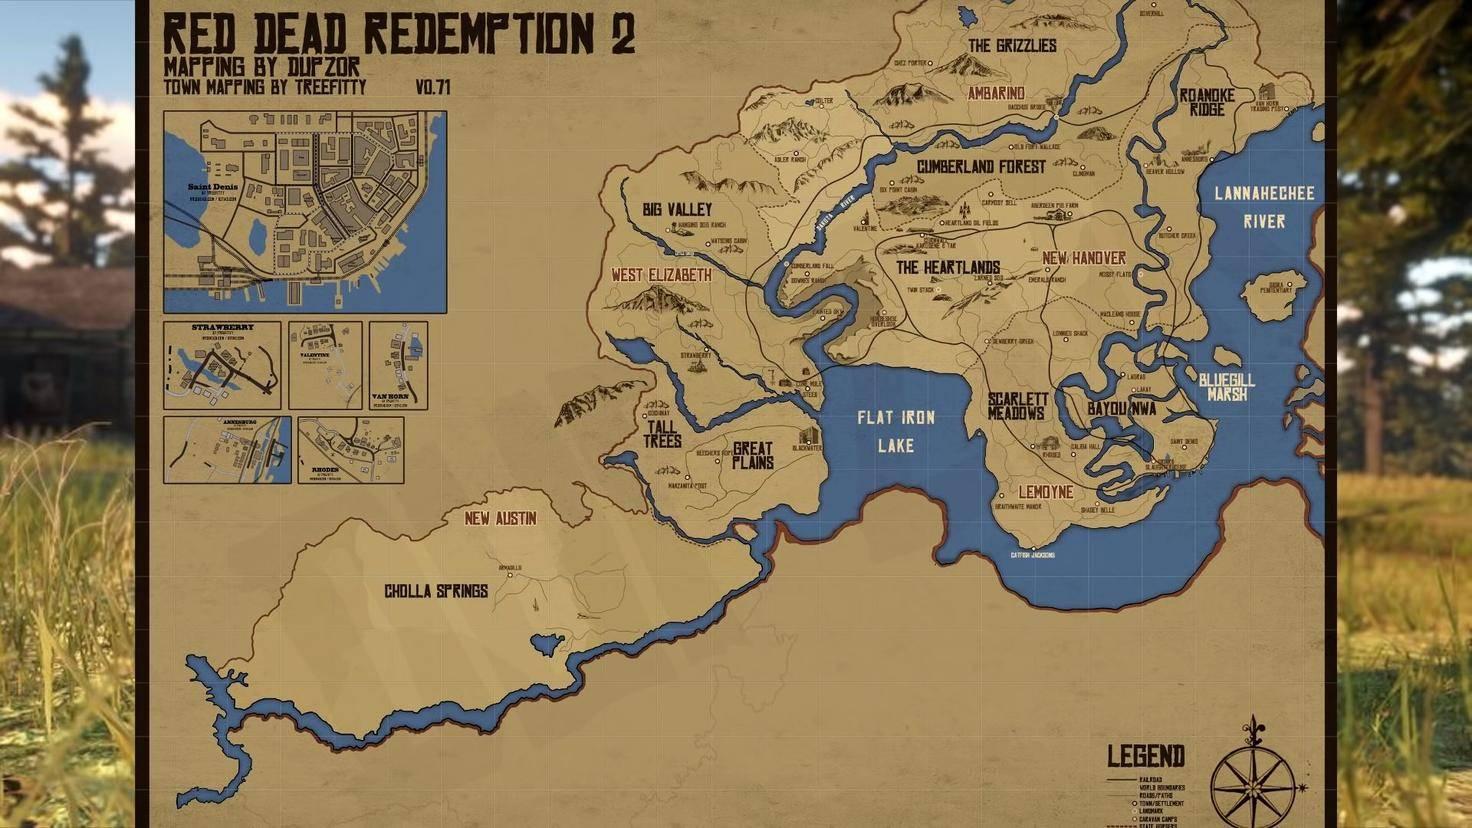 Red dead redemption fanmap